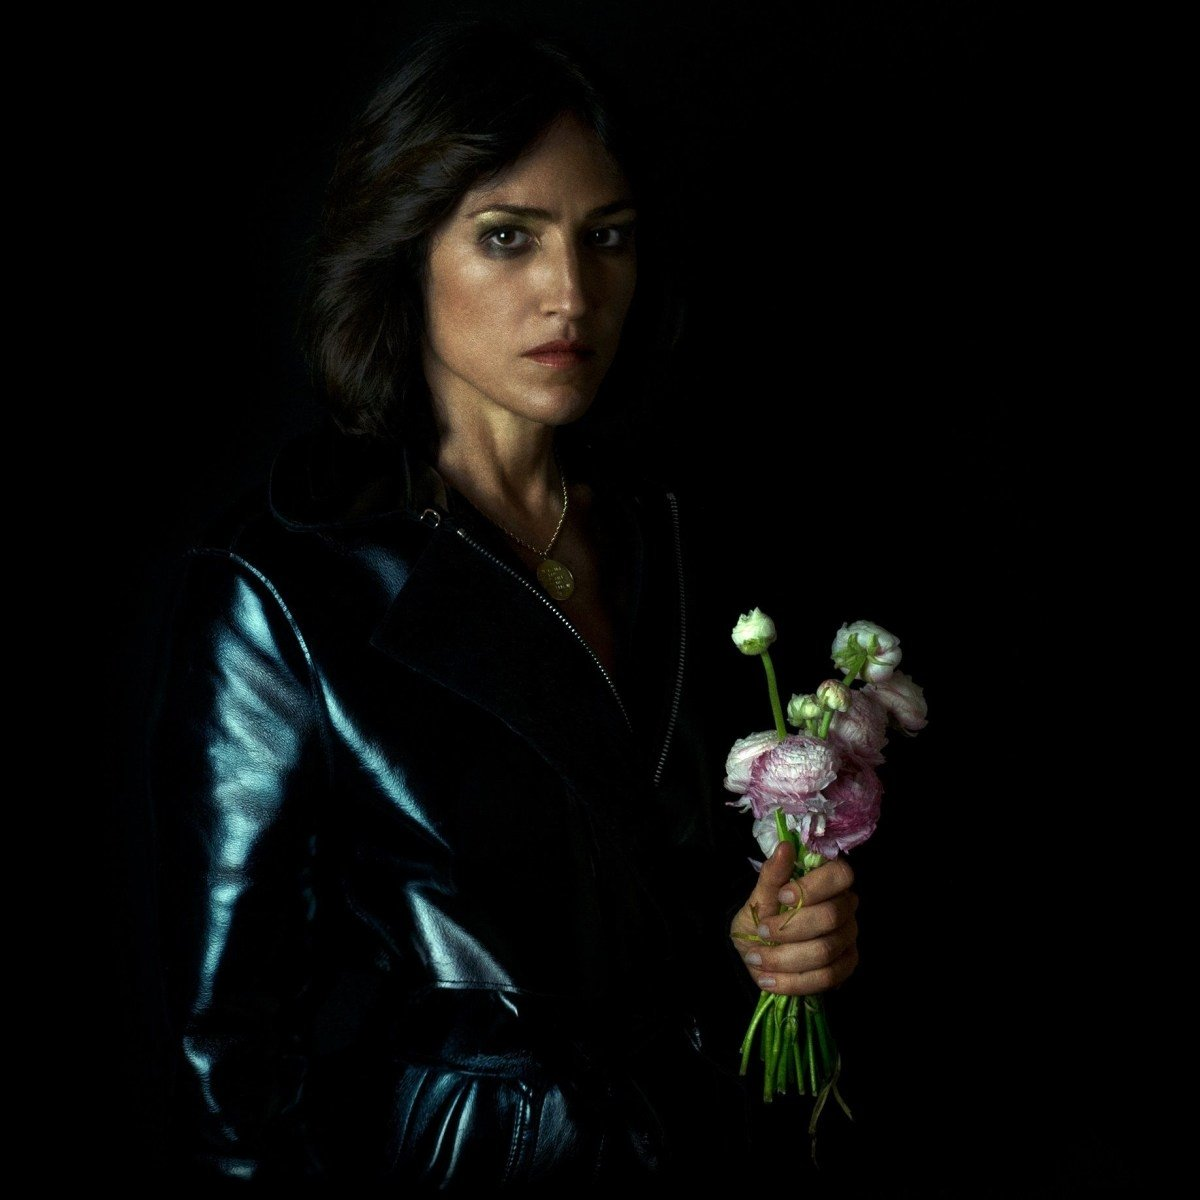 Vinilo : Joan as Police Woman - Damned Devotion (LP Vinyl)